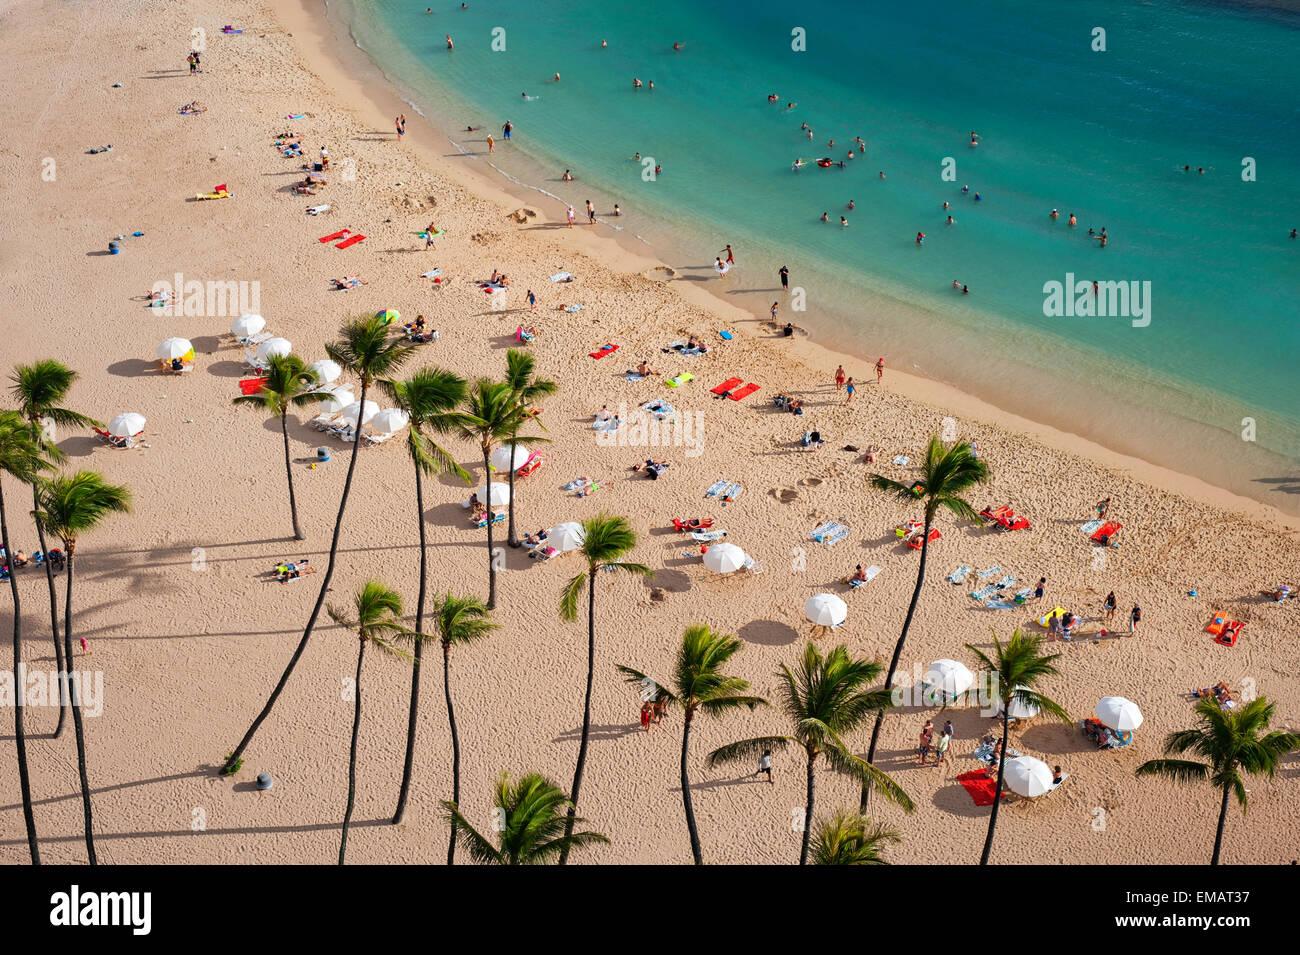 Waikiki beach; Oahu, Hawaii - Stock Image